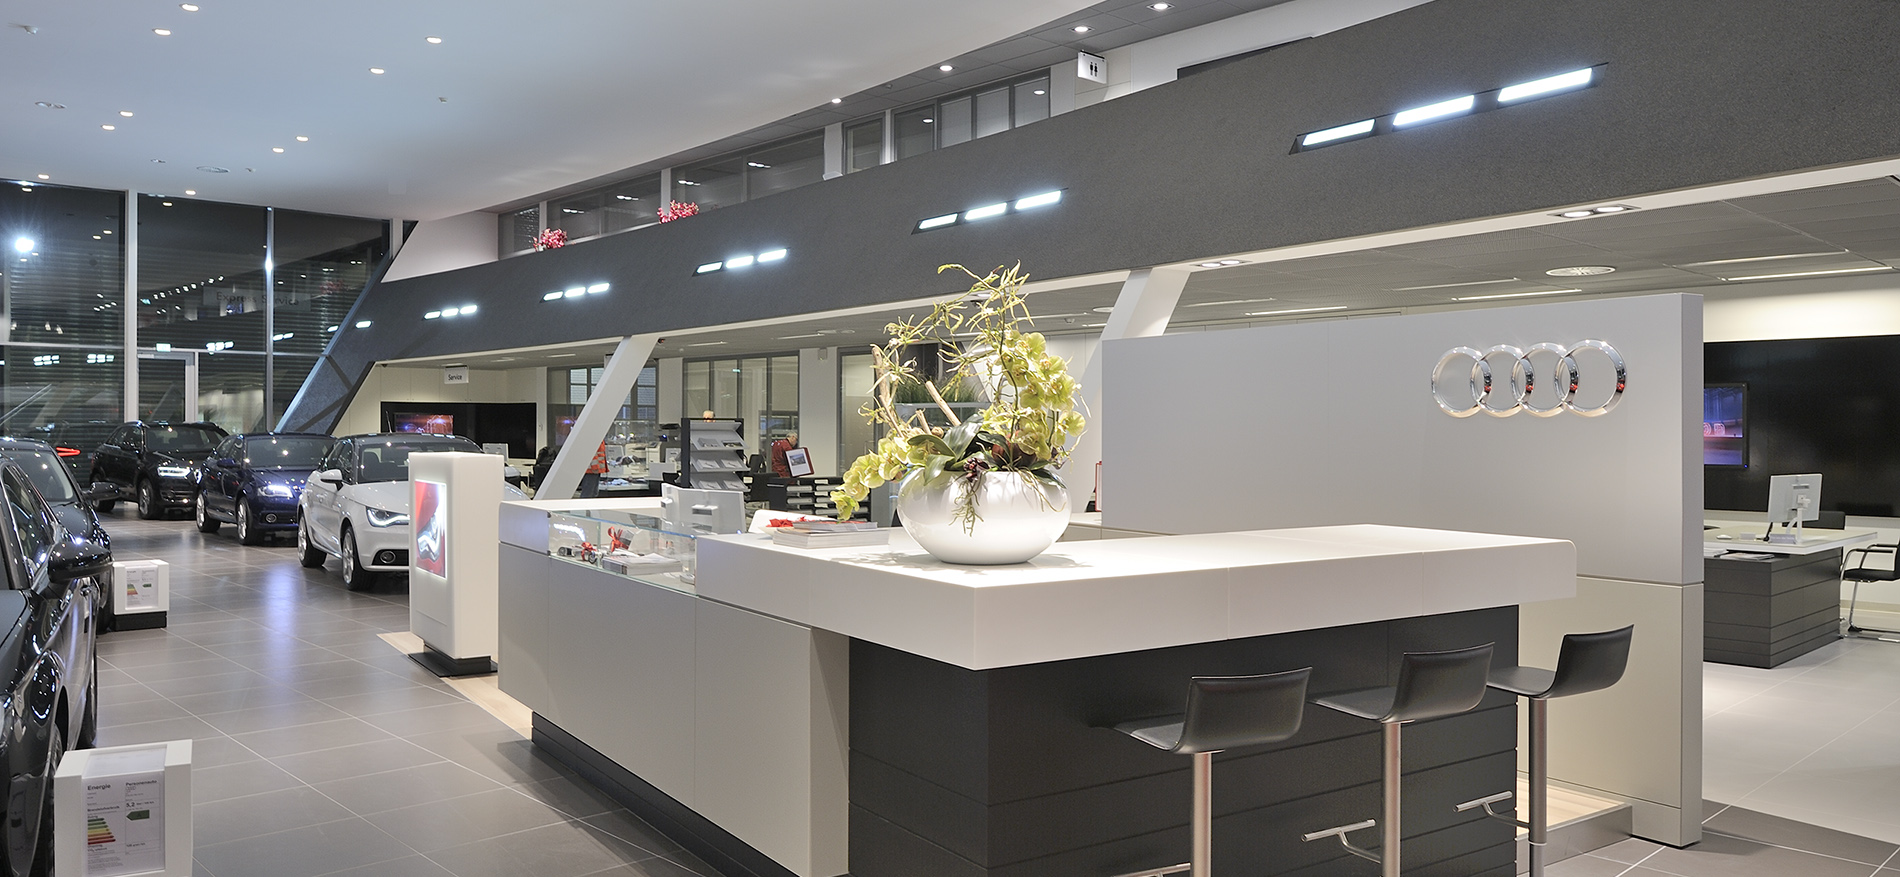 audi showroom inrichting van pondealer amersfoort by wsb interieurbouw. Black Bedroom Furniture Sets. Home Design Ideas